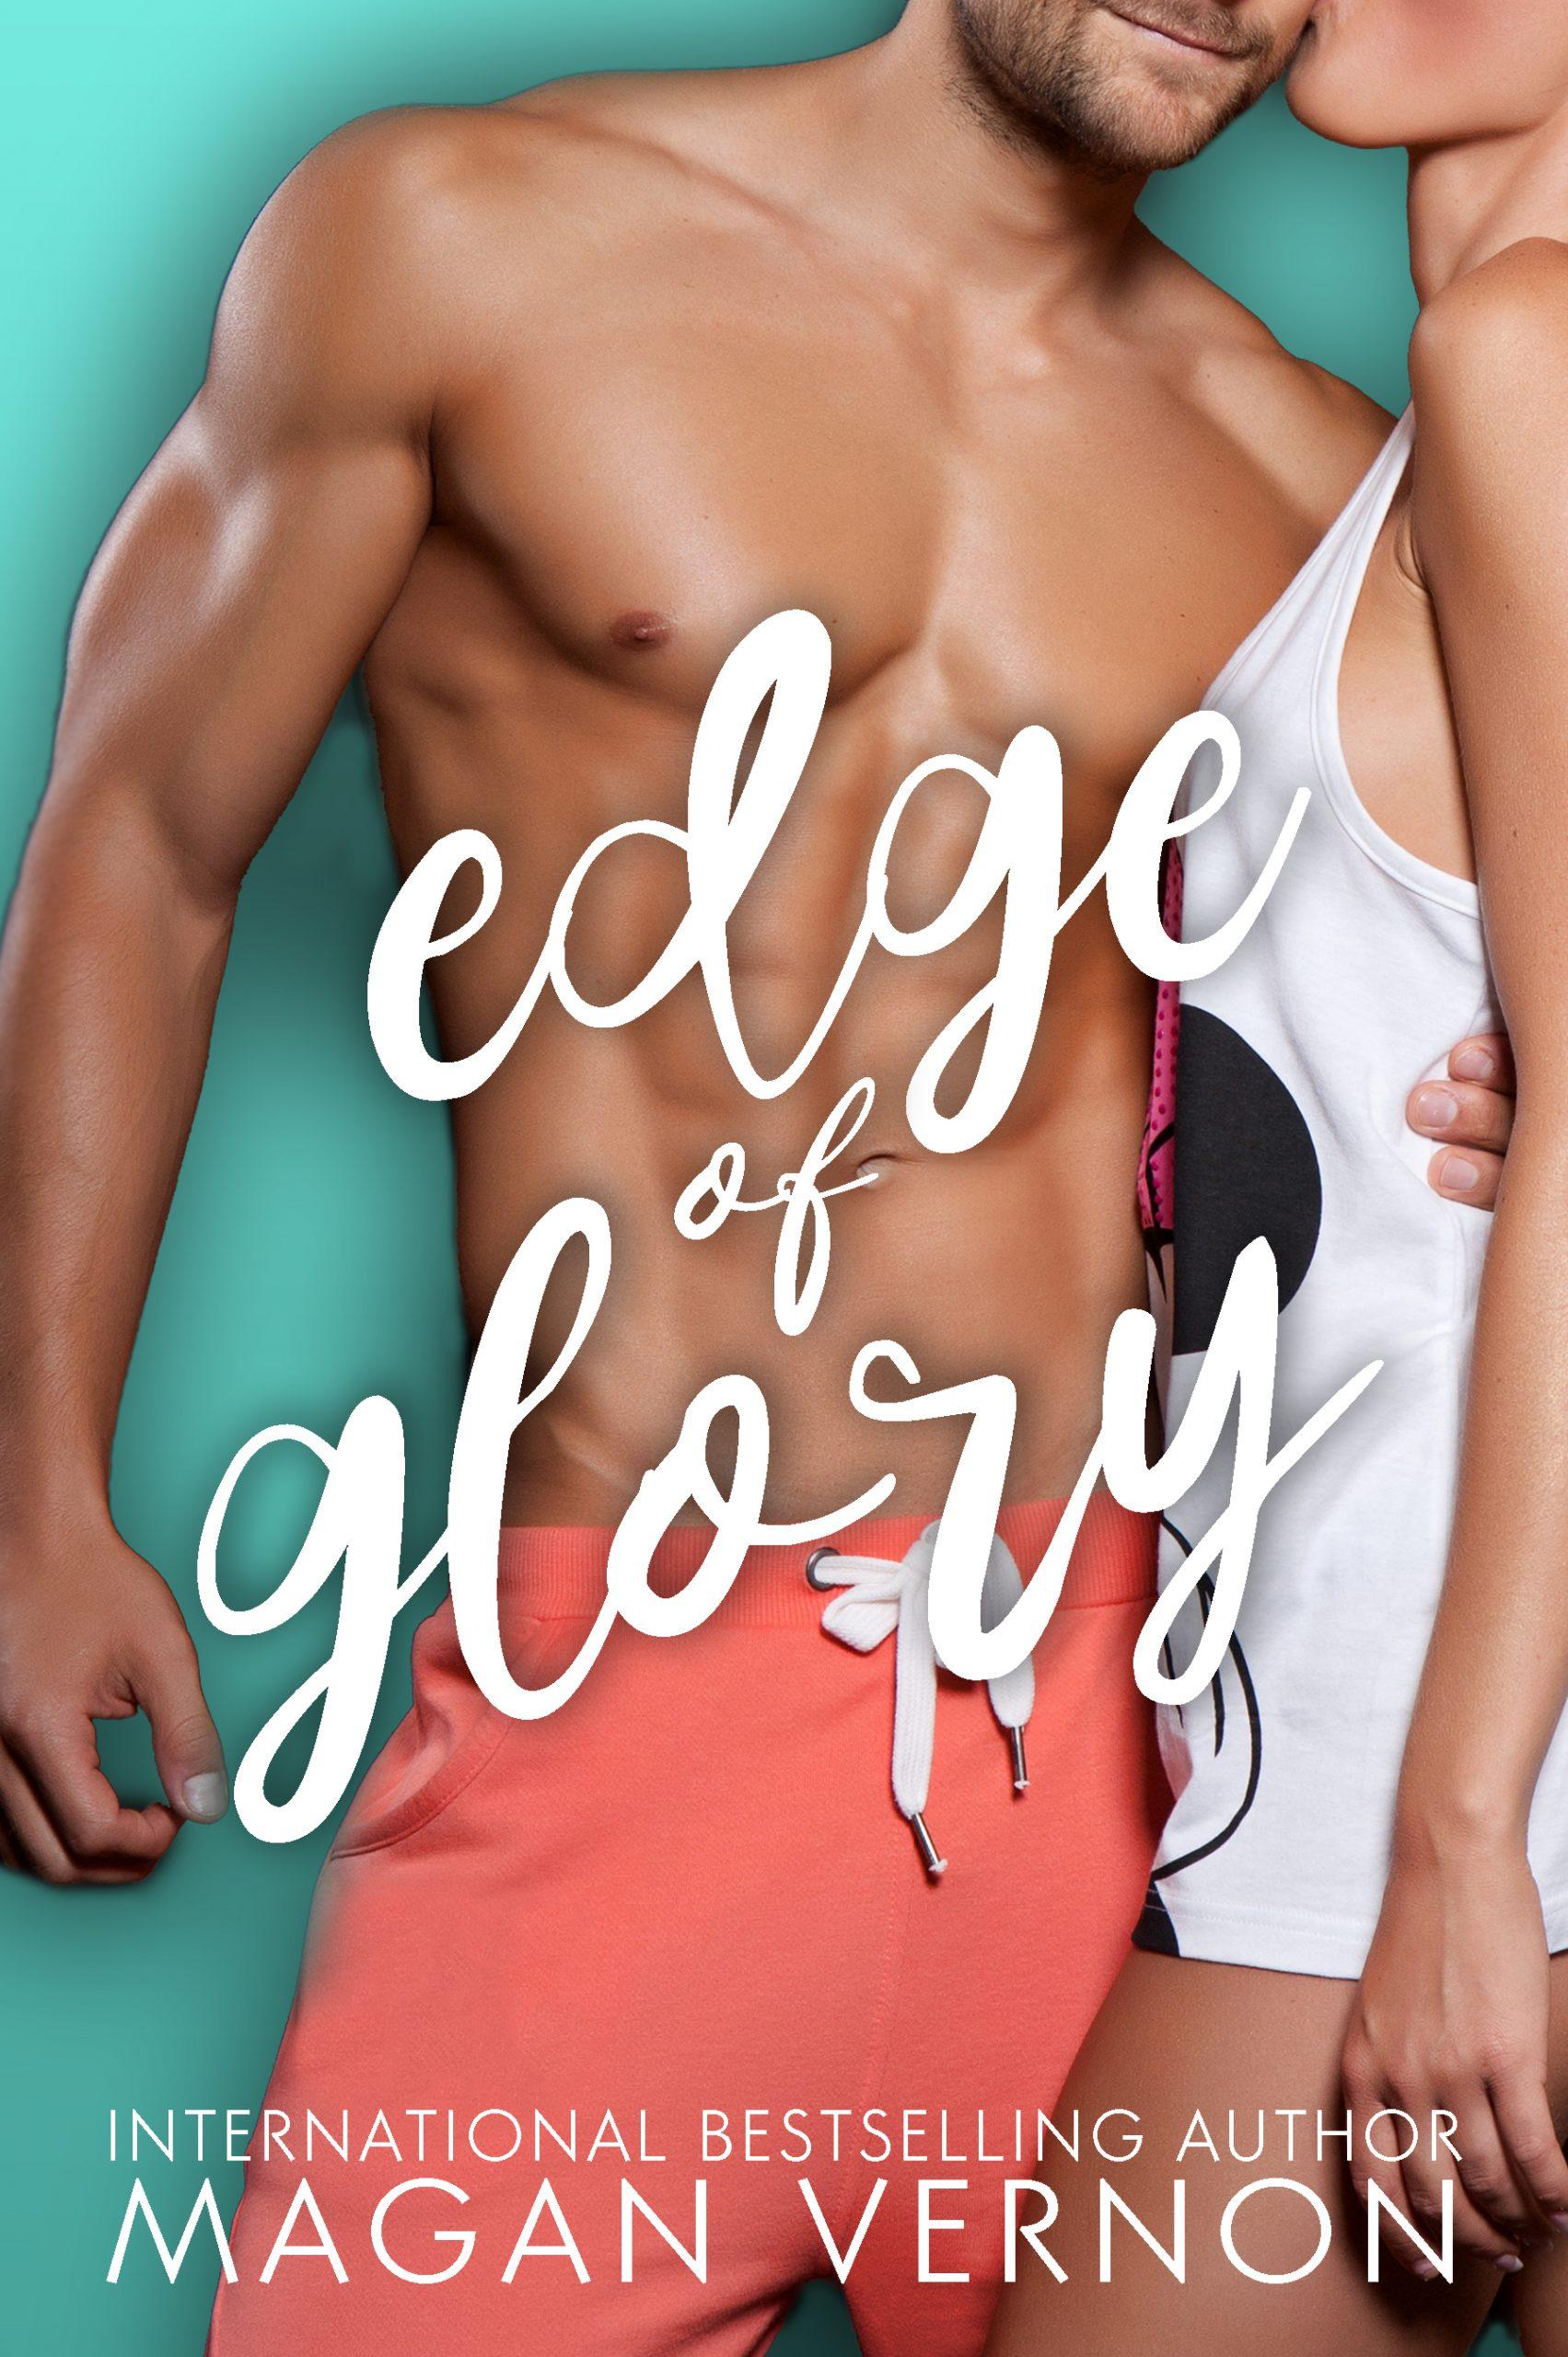 Edge of Glory by Magan Vernon